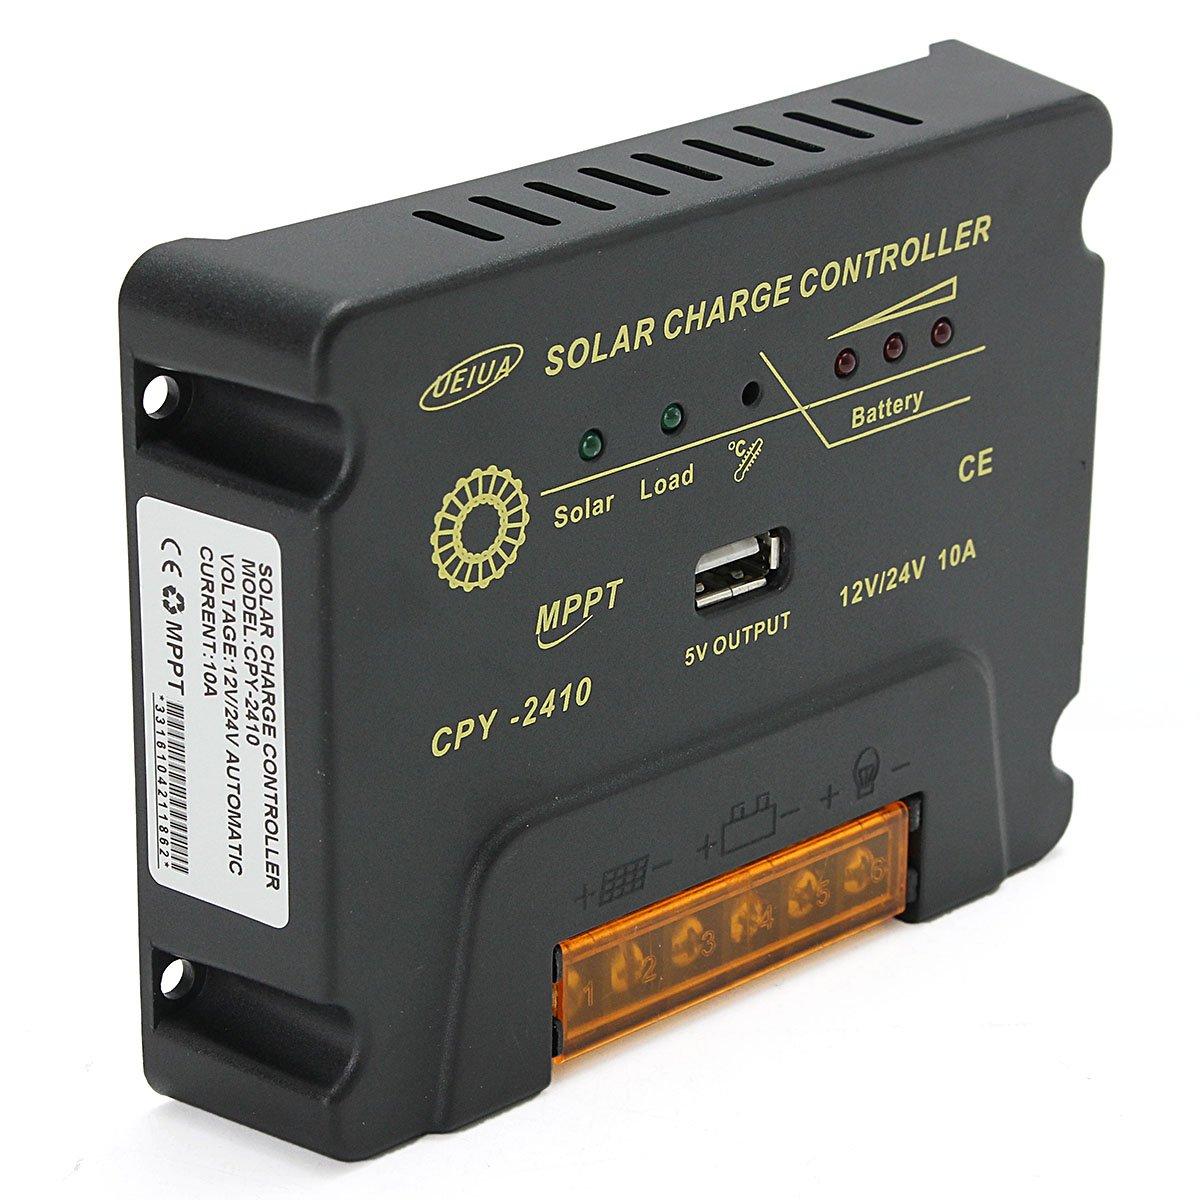 CPY-2410 12V/24V 10A USB MPPT Solar Panel Battery Charge Controller